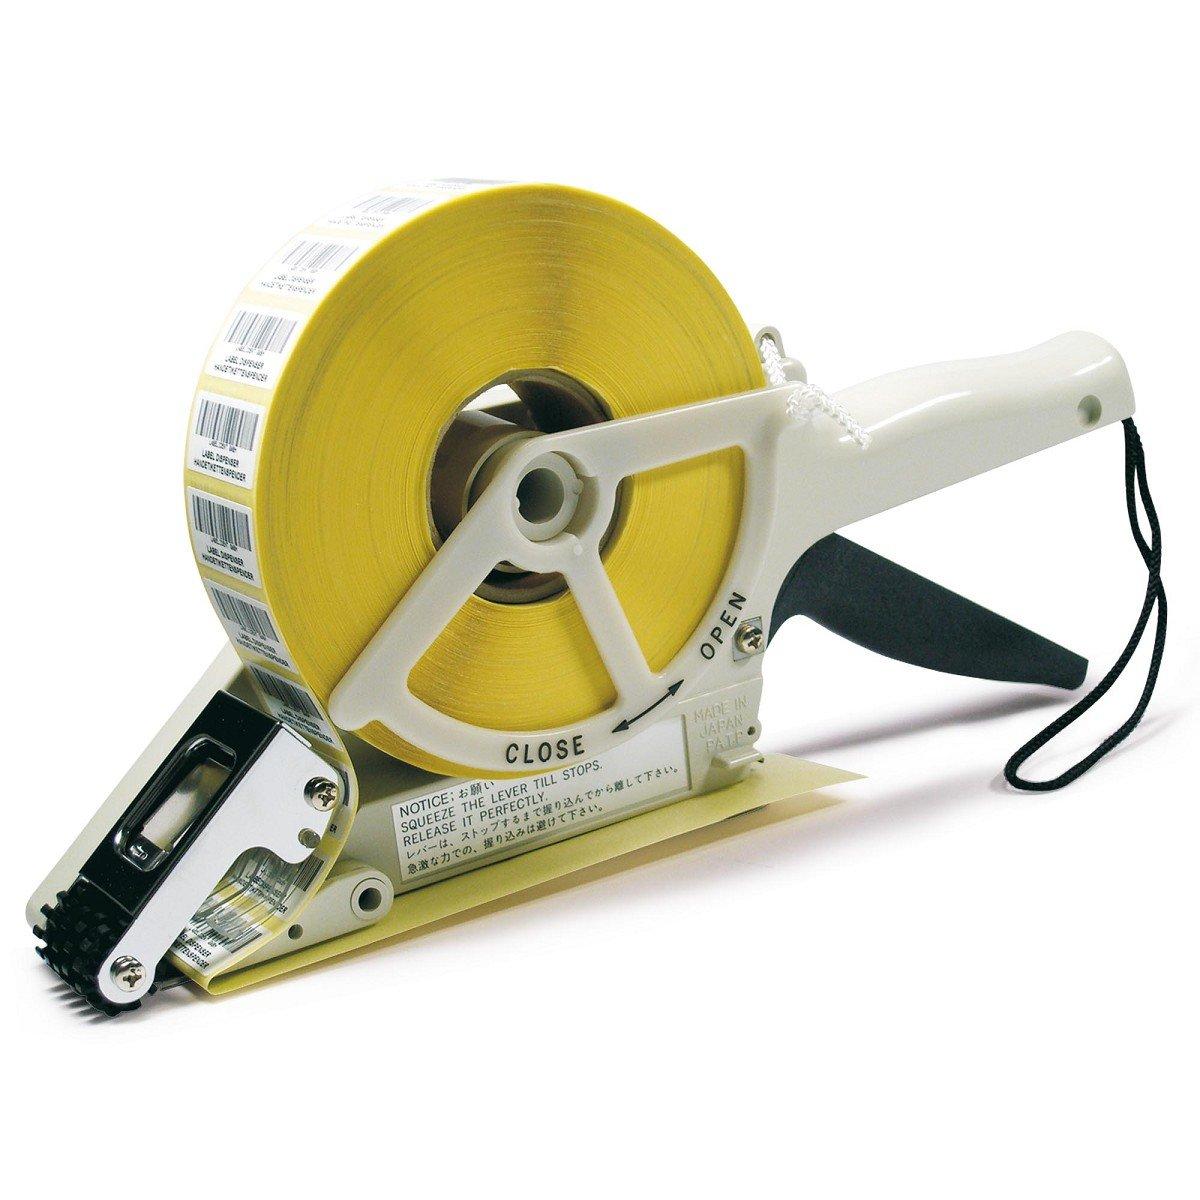 Te de Office Towa etiquetas mano Dispensador Dispensador de etiquetas mano etiqueta dispensador de plástico para etiquetas adhesivas manual 20 A 30 mm: ...